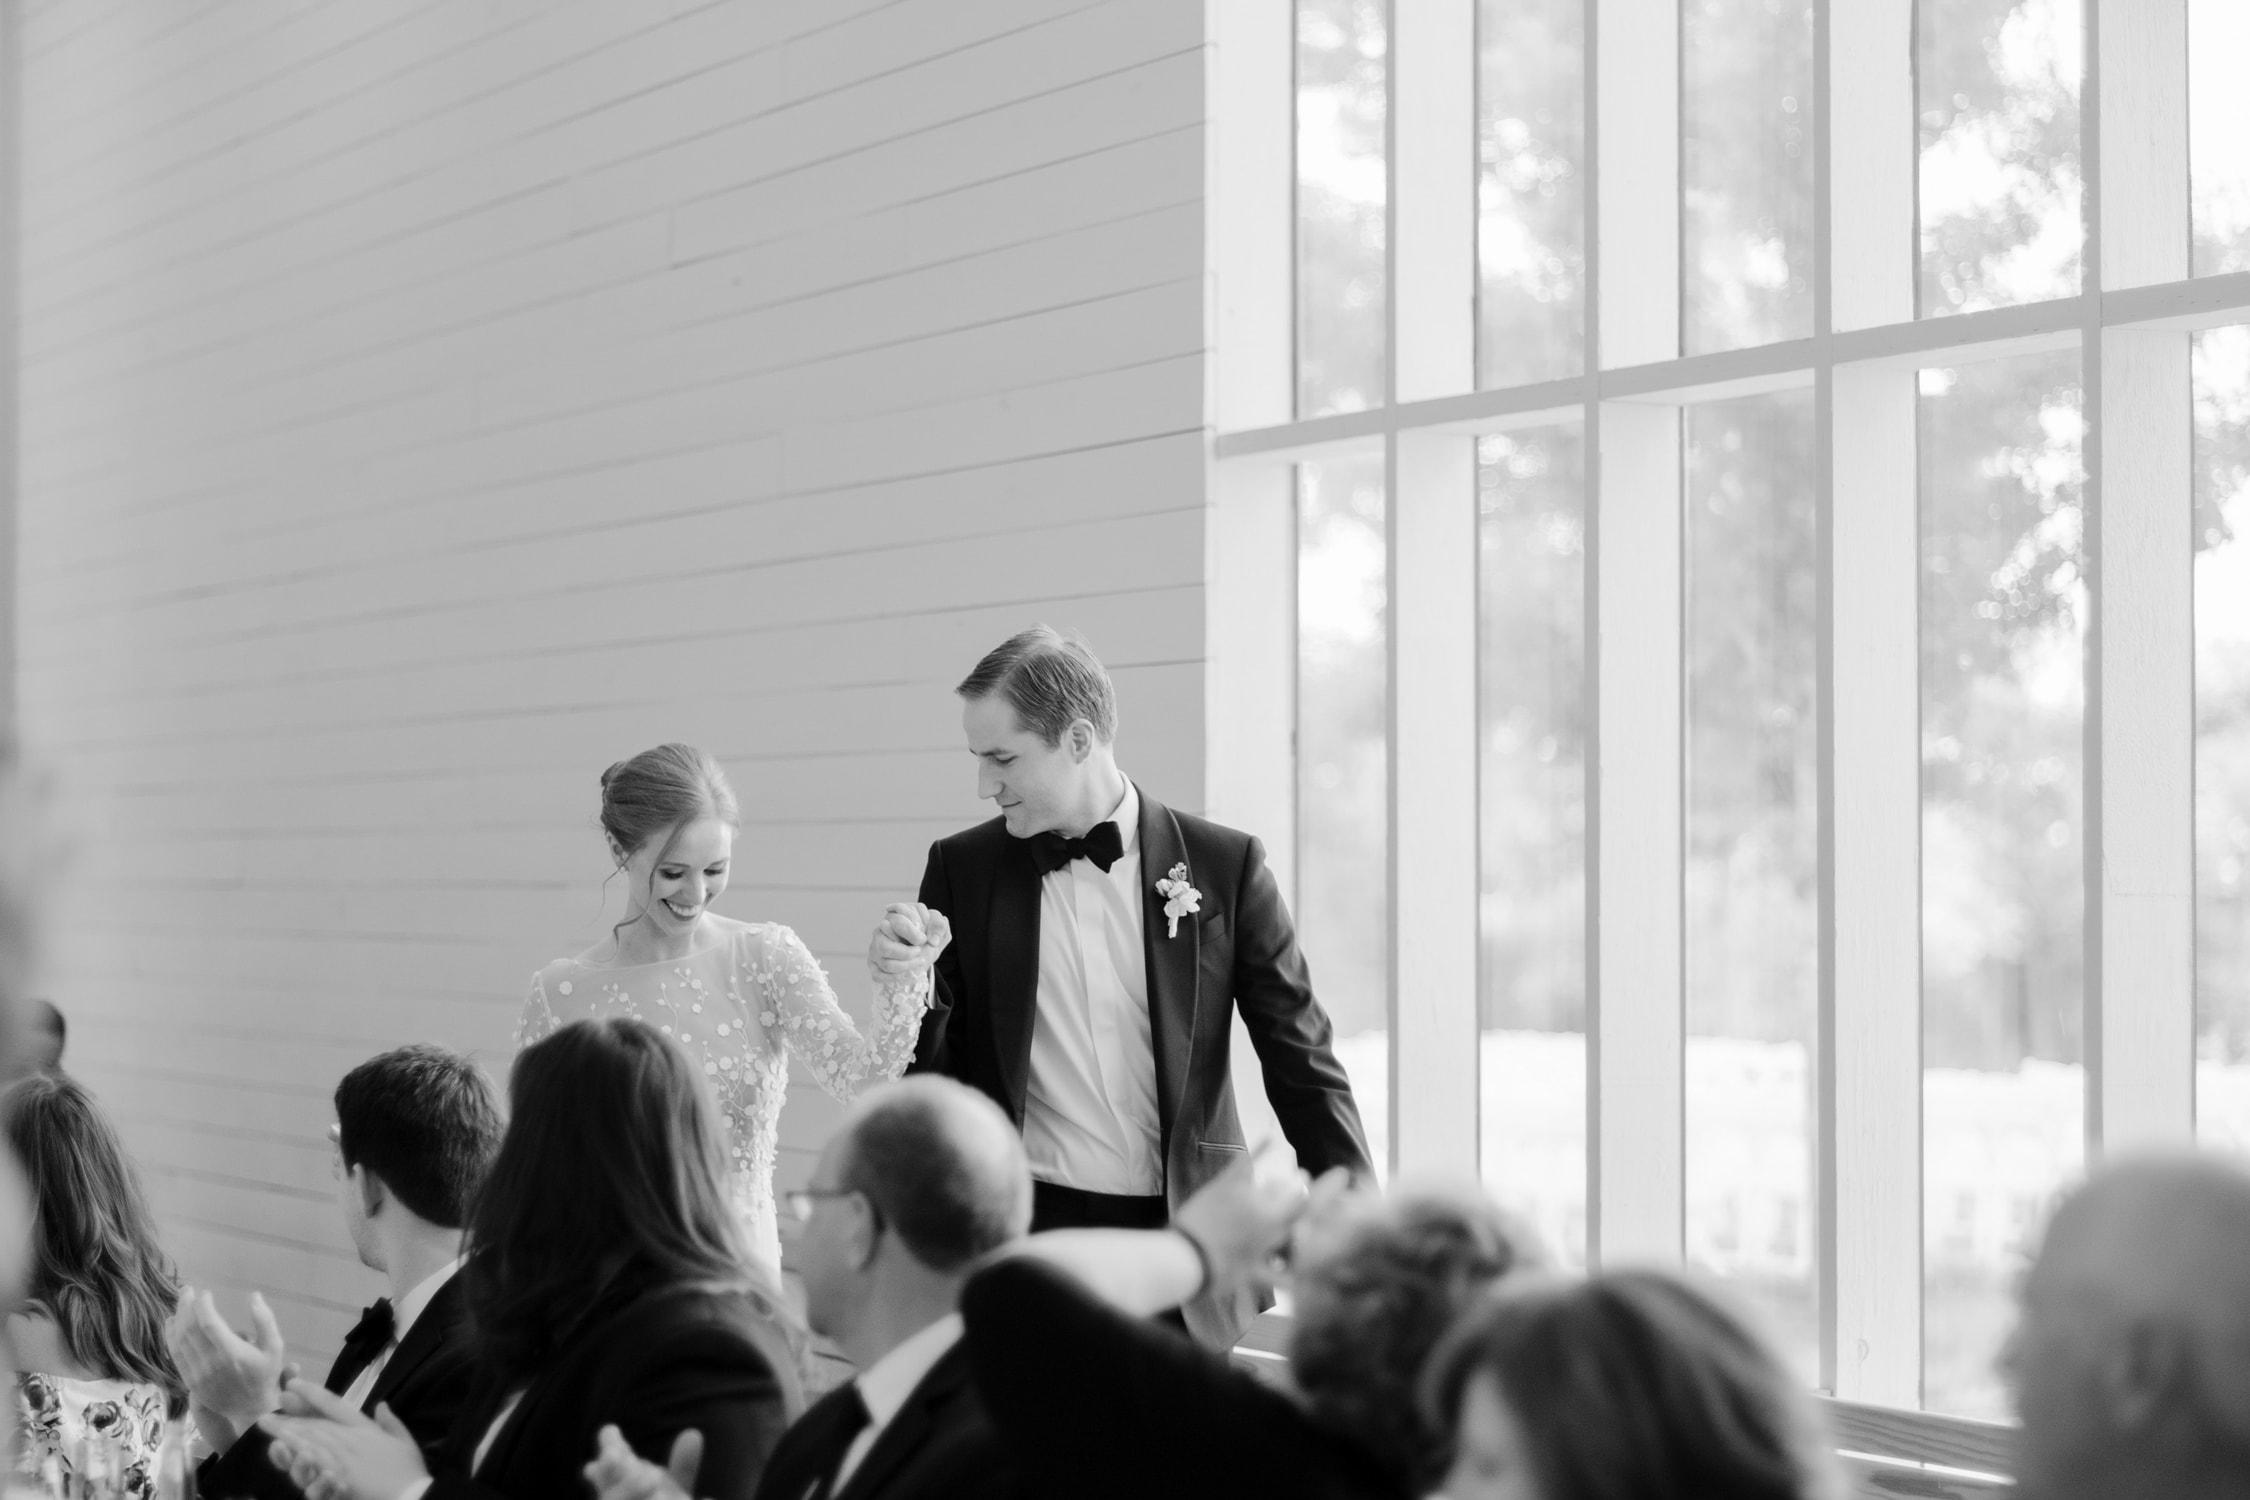 PROSPECT_HOUSE_WEDDING_AUSTIN_TX_MATTHEW_MOORE-00730.jpg